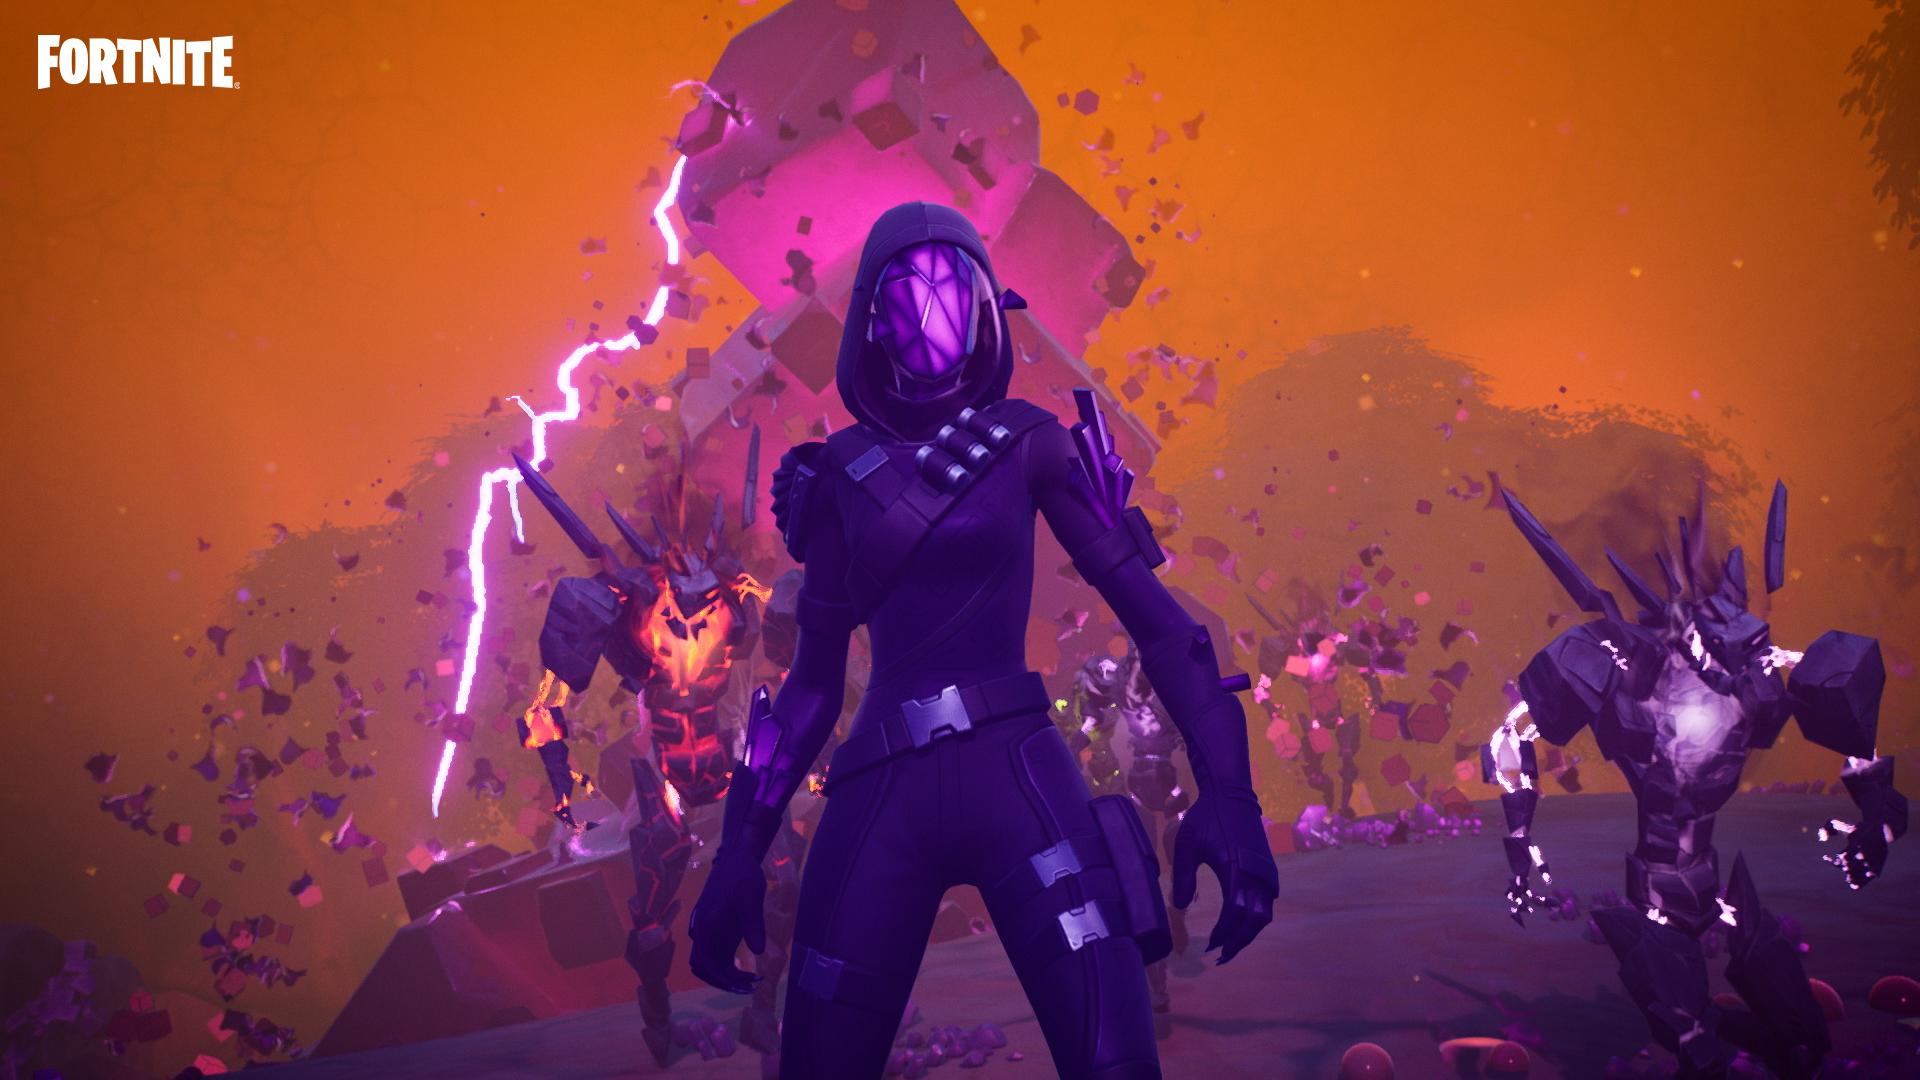 Fortnite Season 8: How To Complete A Sideways Encounter - GameSpot